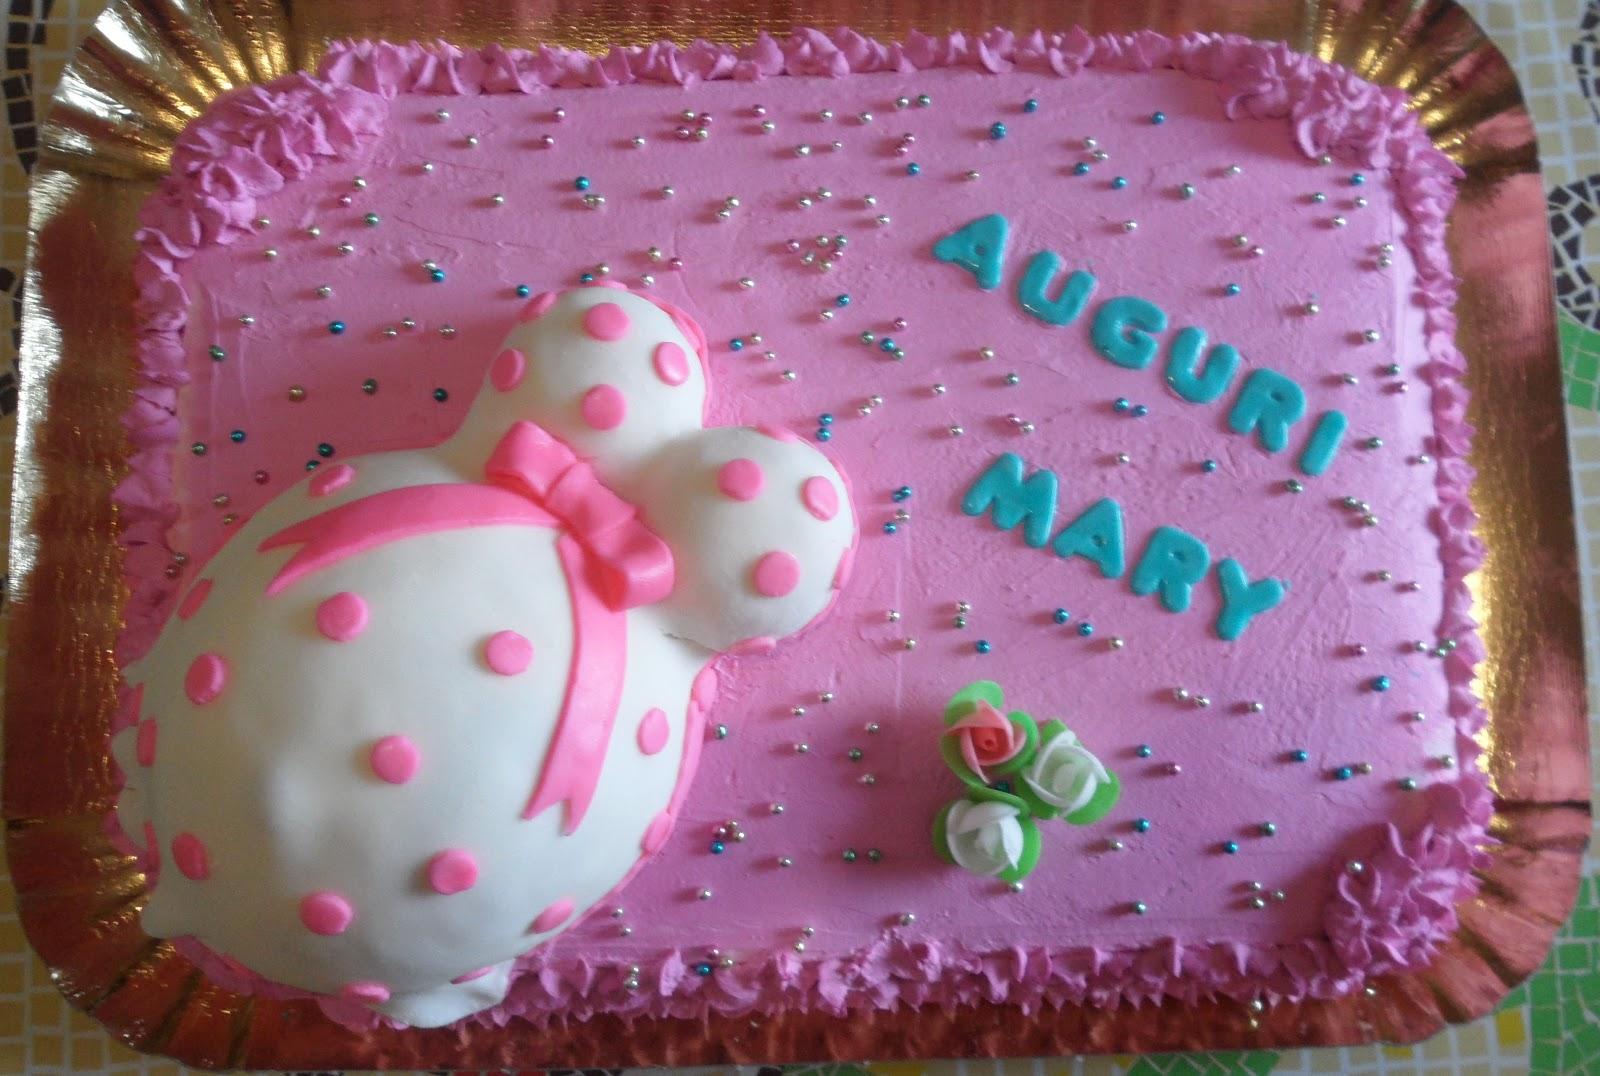 Torta Compleanno Neo Mamma.Torte A Tema Di Kriss Cagliari Sardegna Torta Per Futura Mamma In